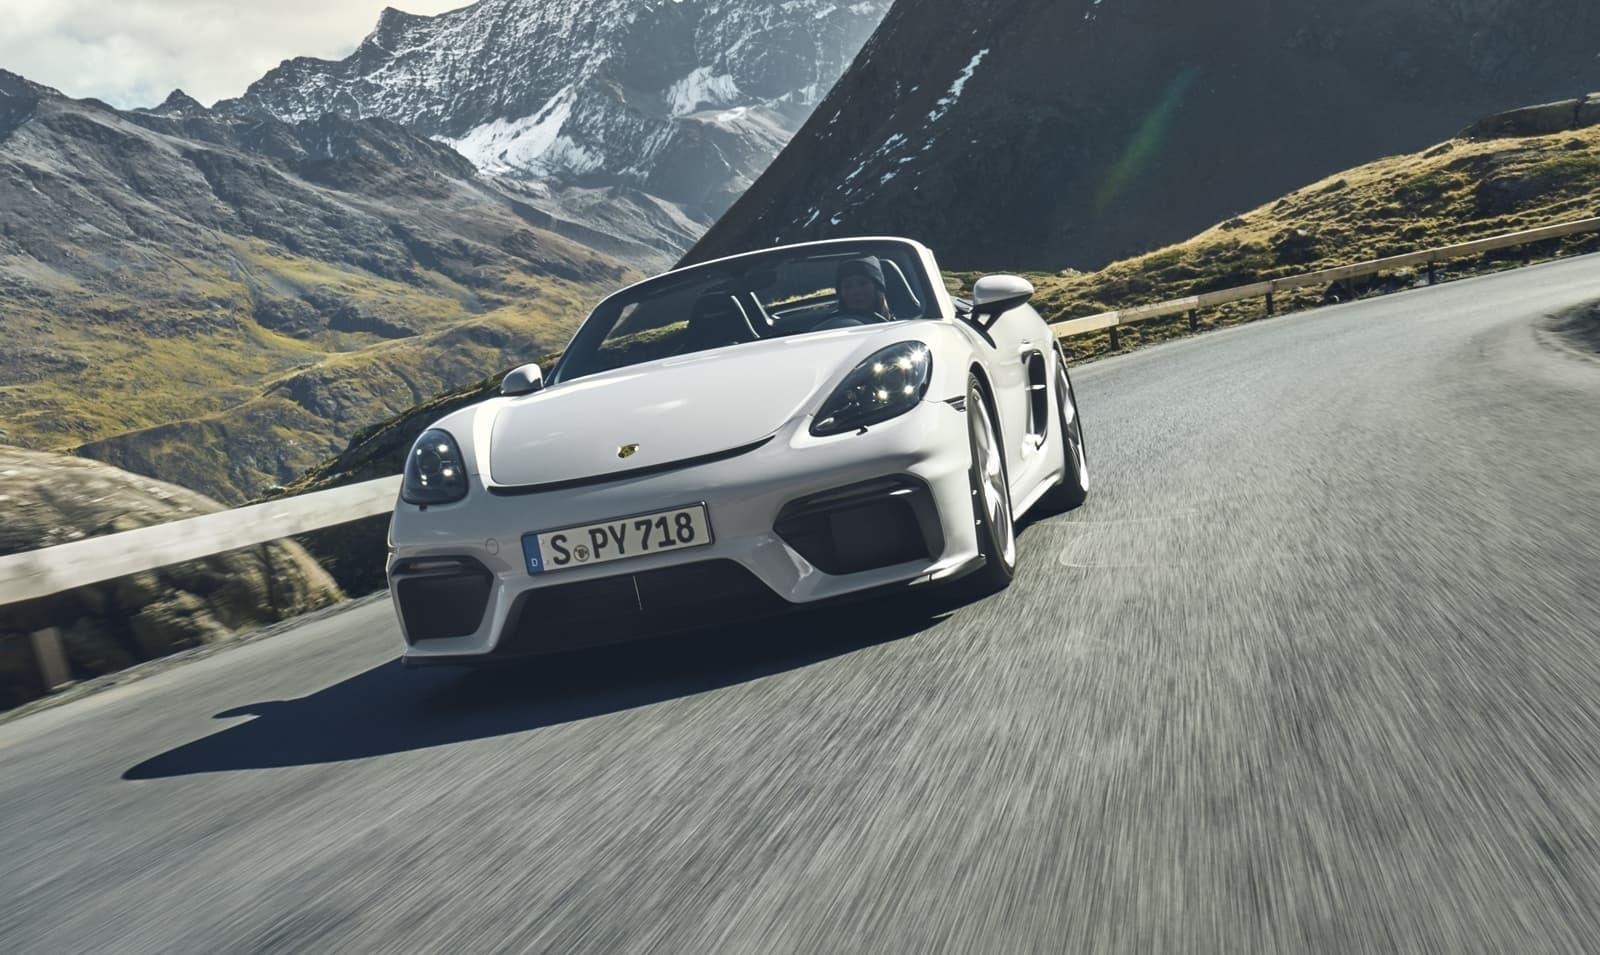 Porsche 718 Spyder 2019 0619 004